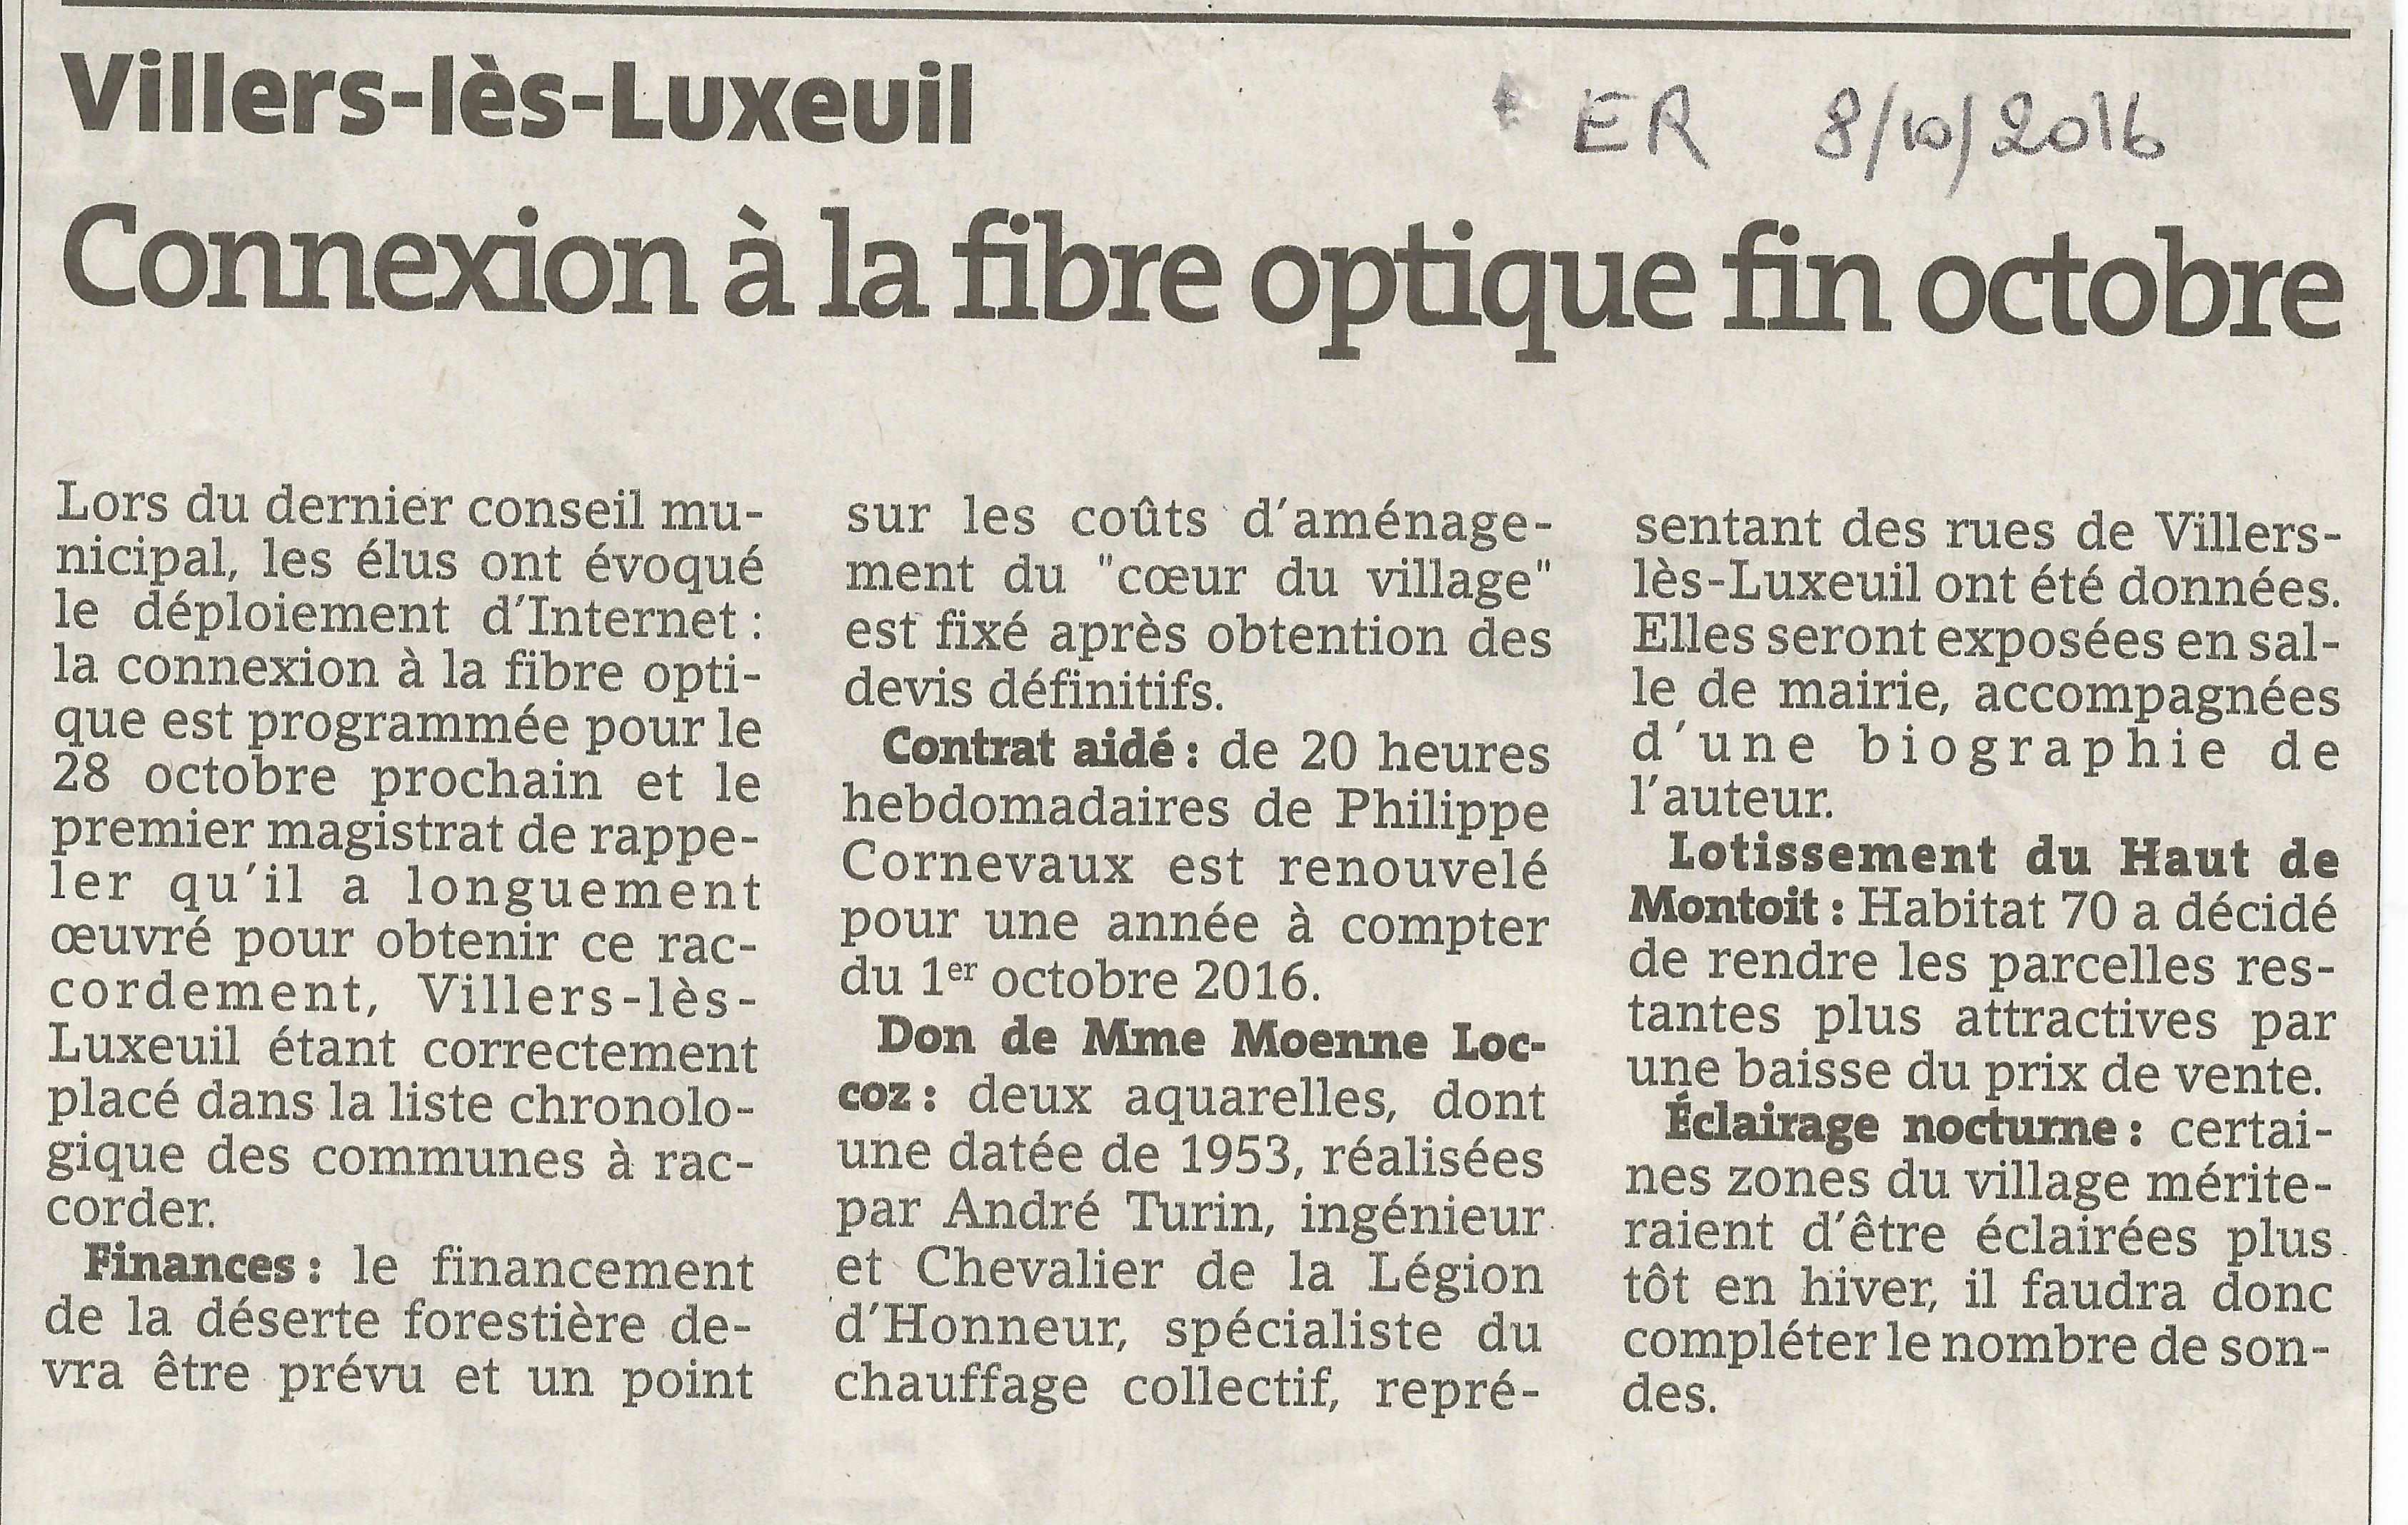 https://www.villers-les-luxeuil.com/projets/villers/files/images/2016_Mairie/Presse/2016_10_08.jpg